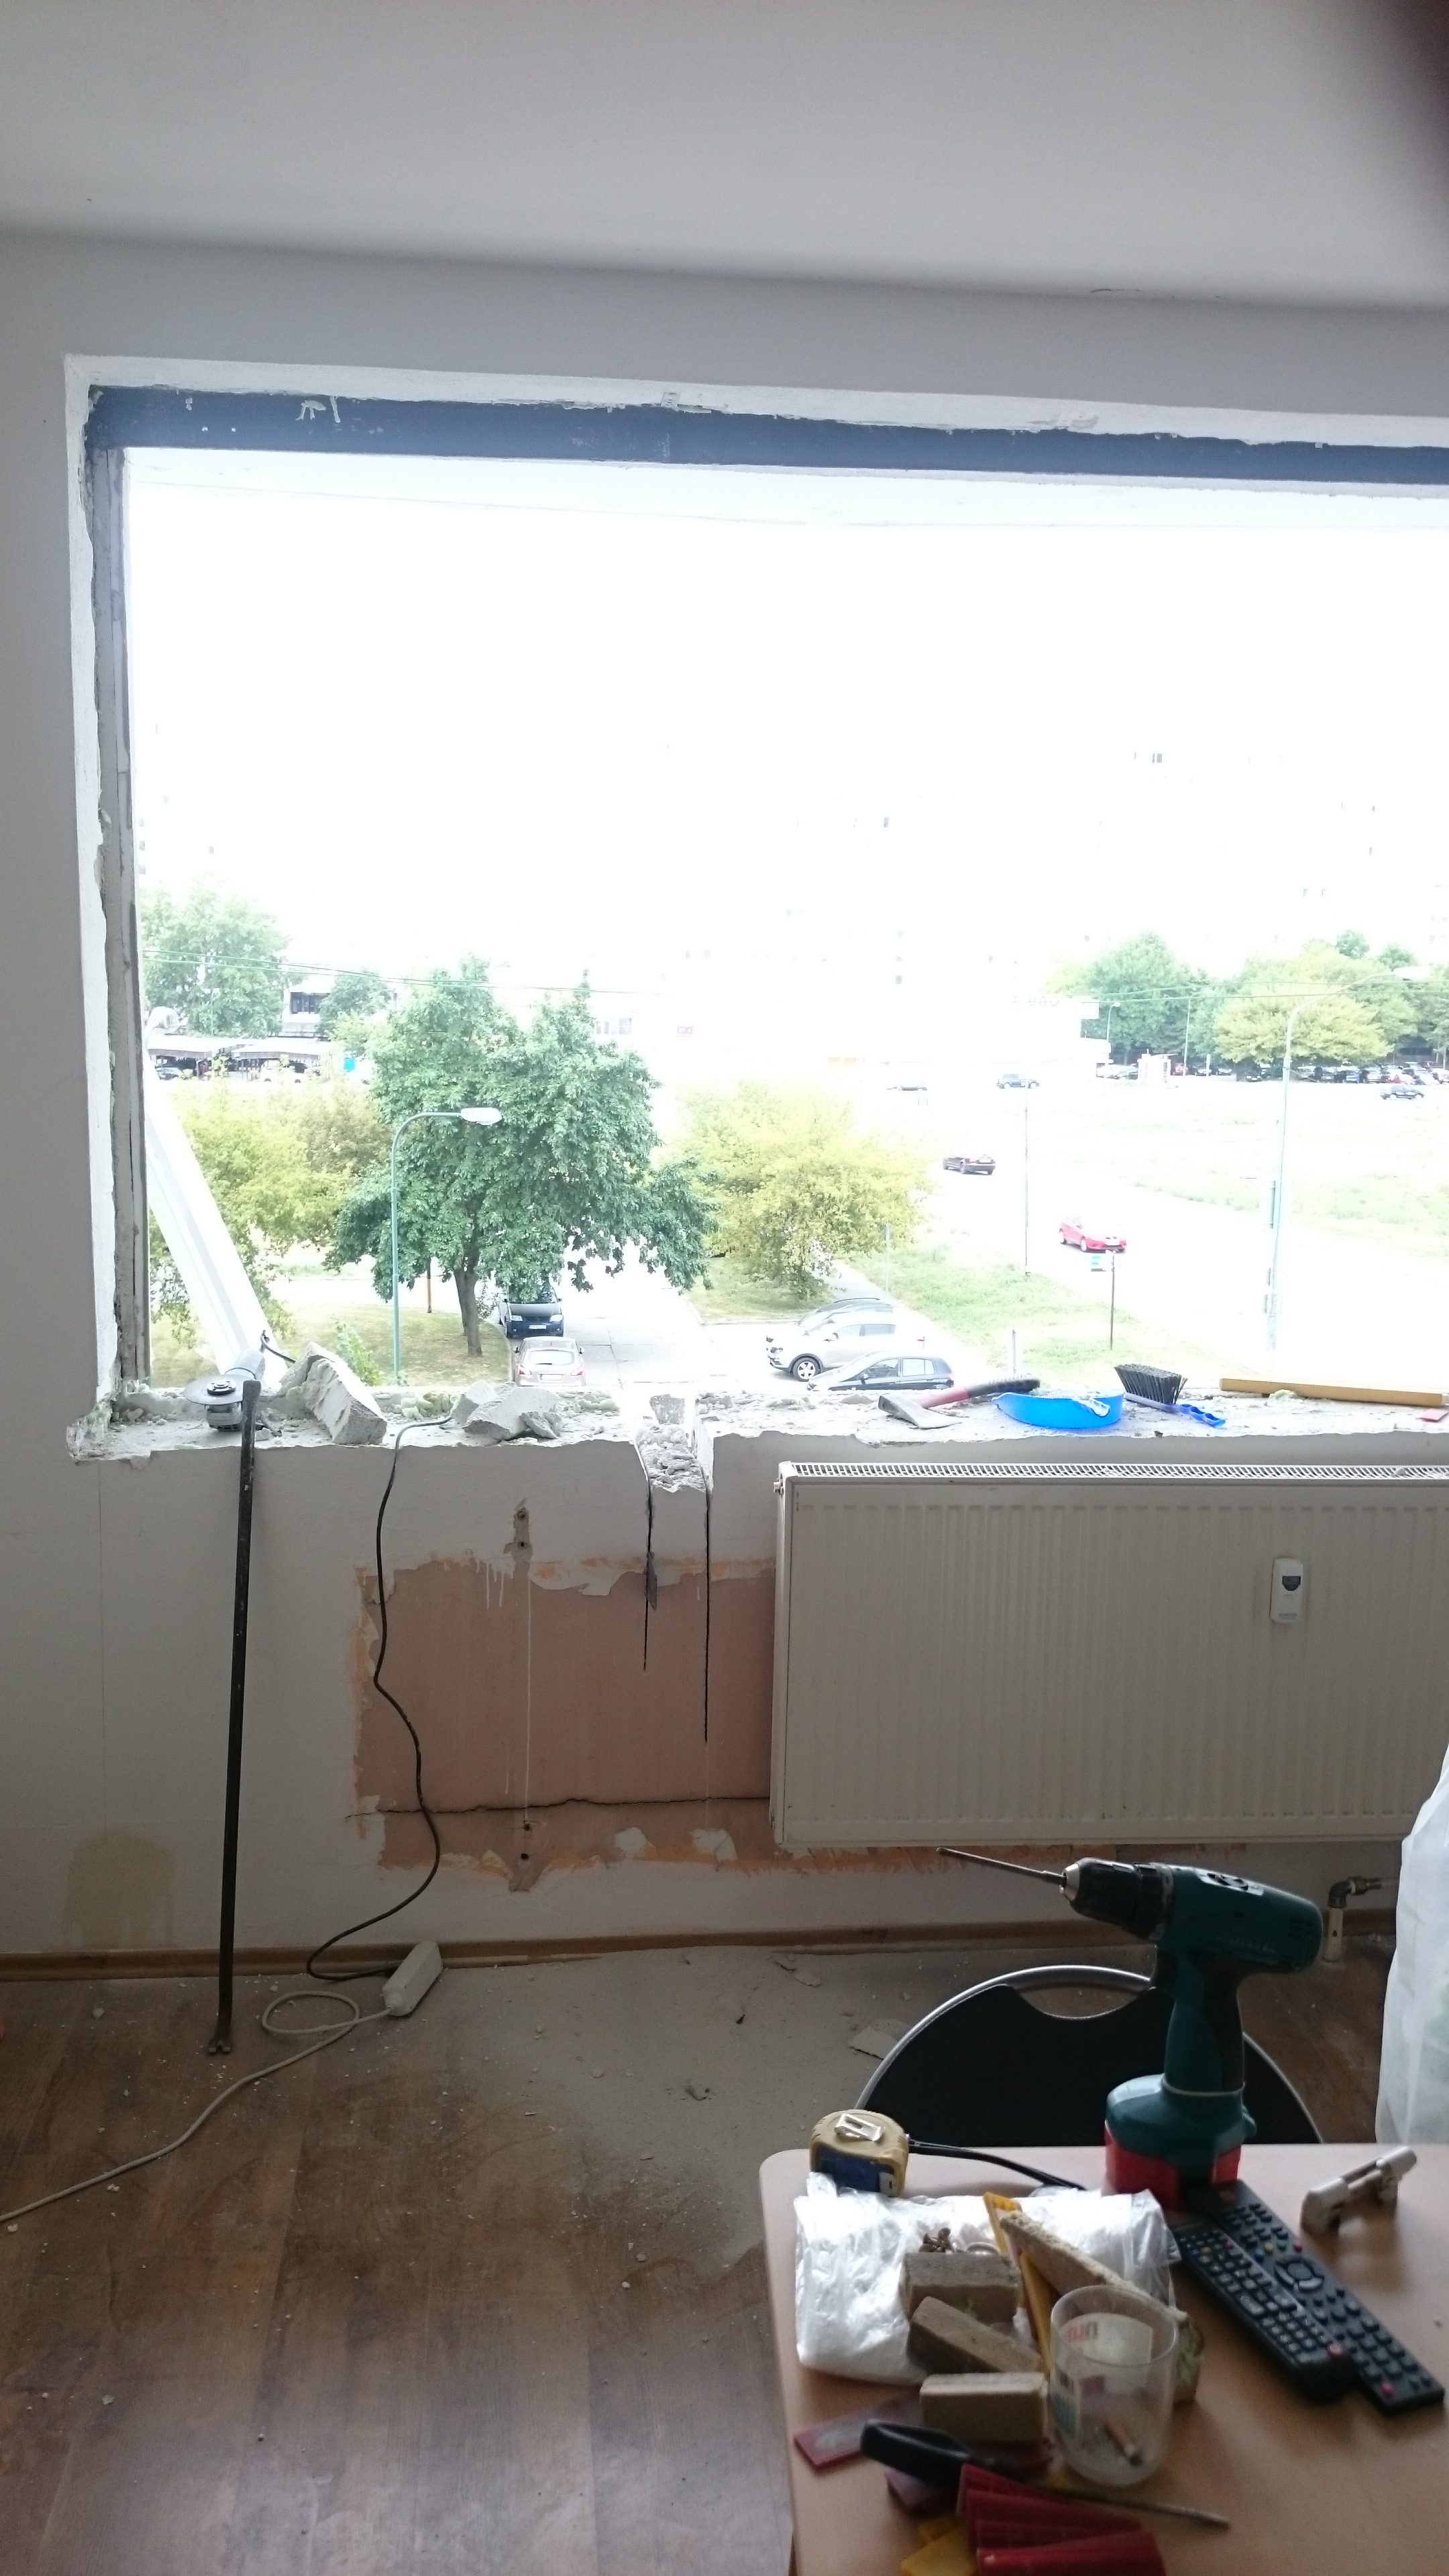 Vyrezanie otvoru balkón 1